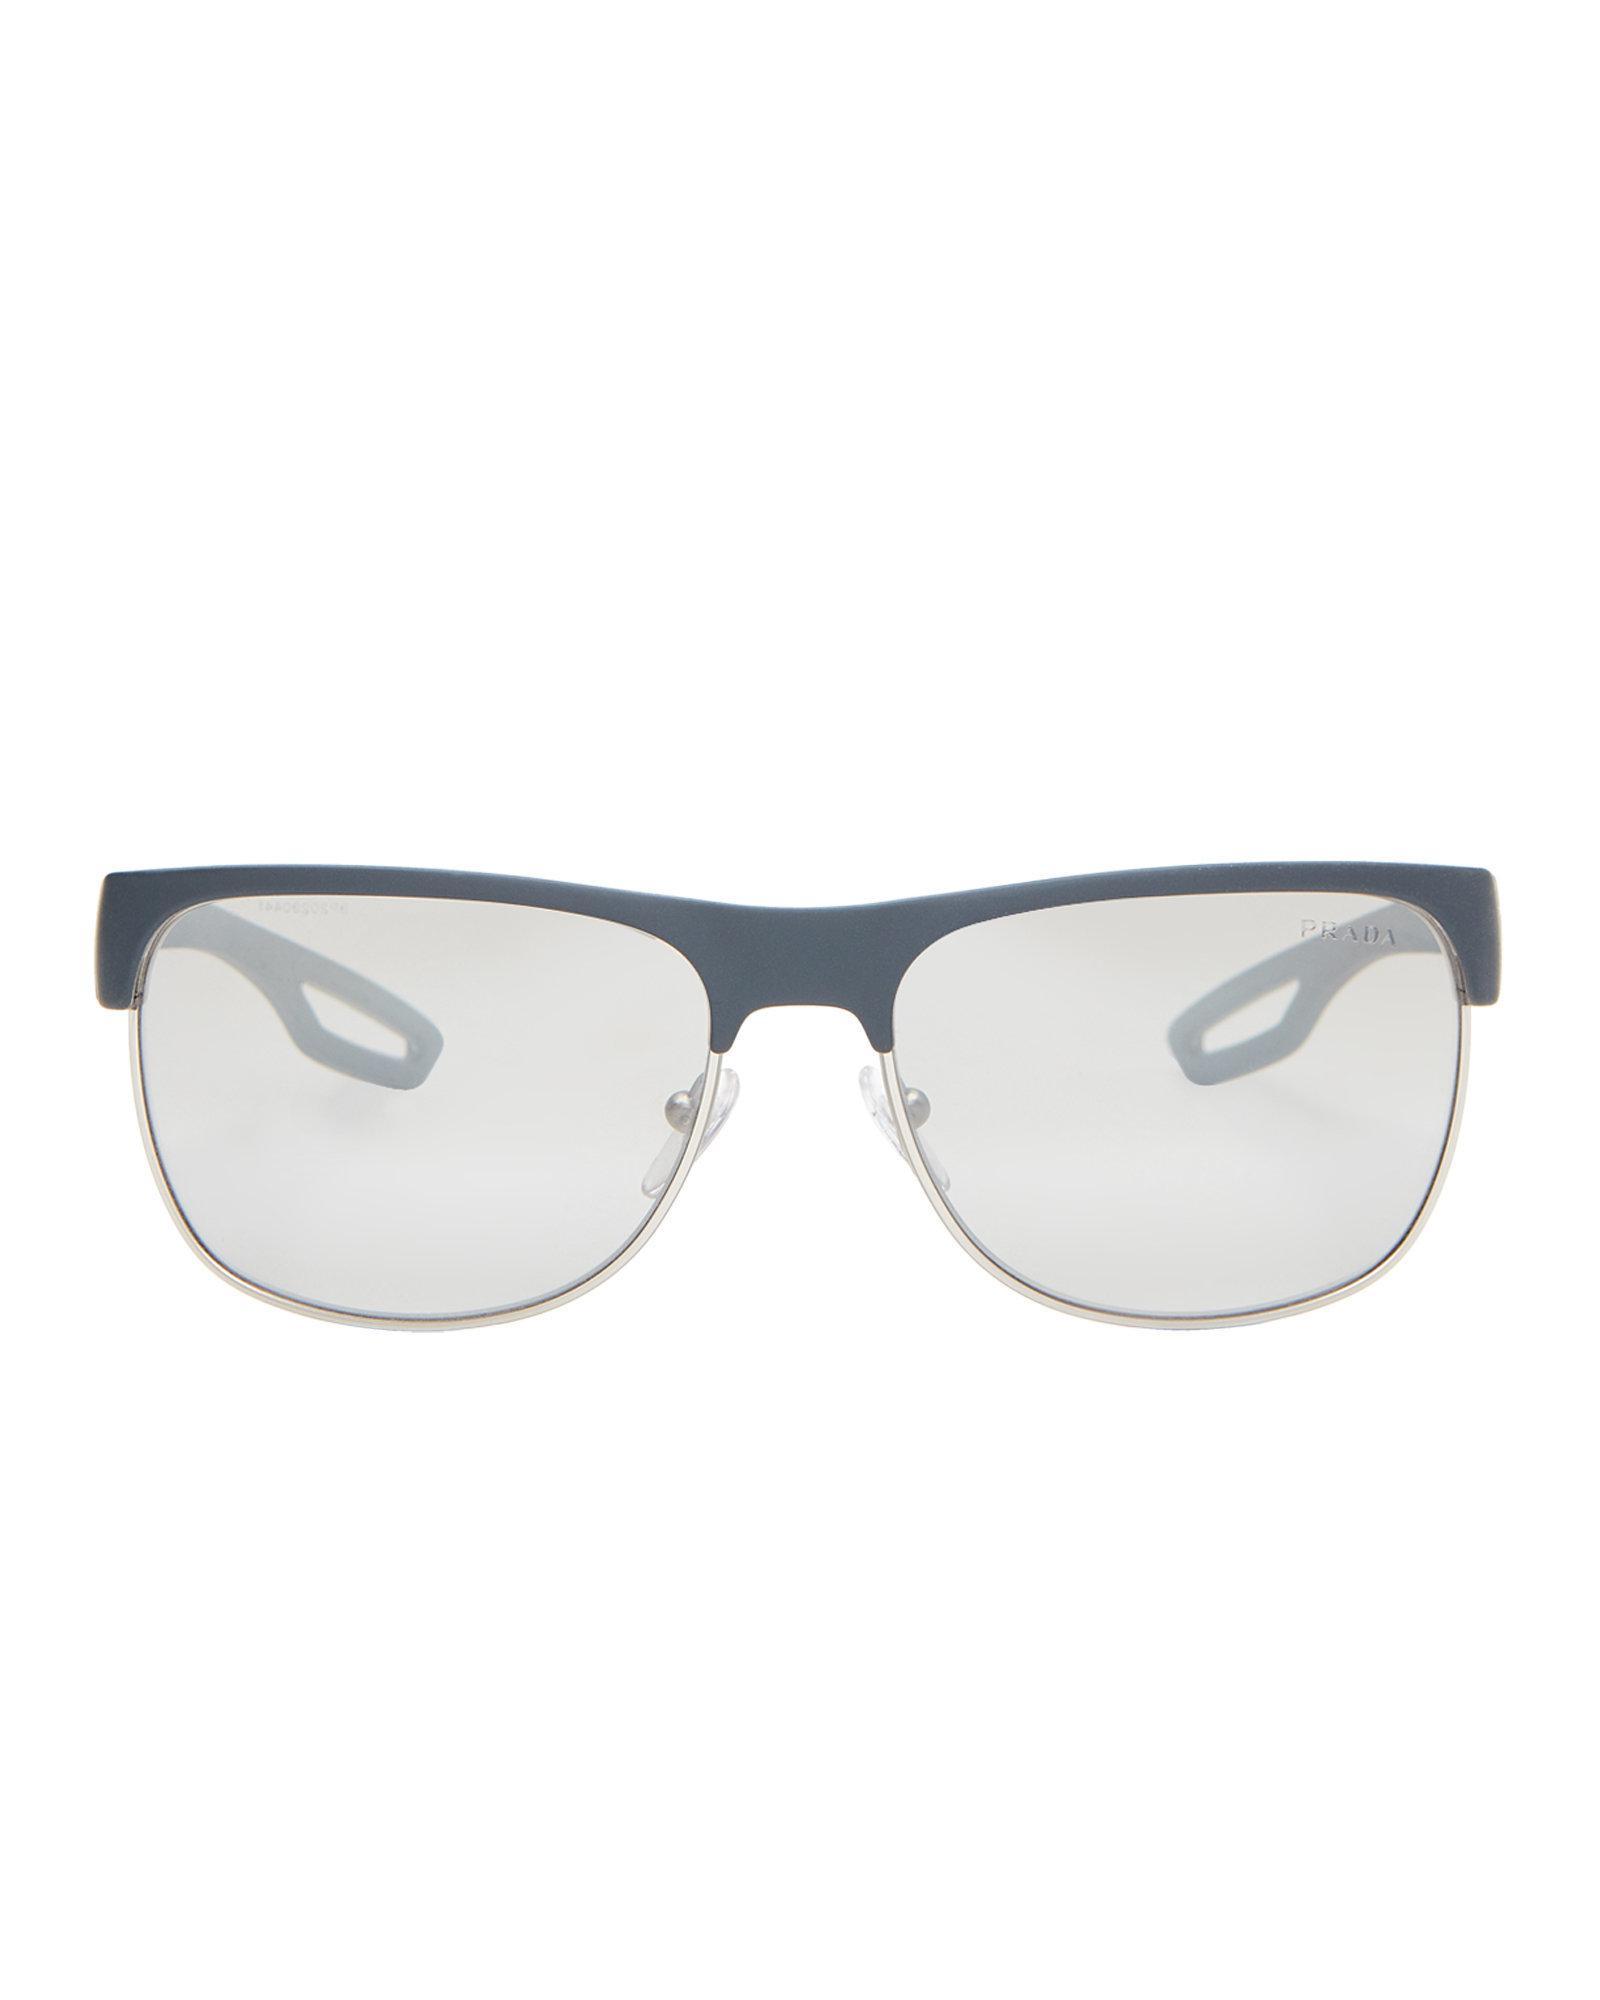 31d5f91a35f22 Prada Sport Sps 57q Grey   Silver-tone Rectangle Half-rim Sunglasses ...